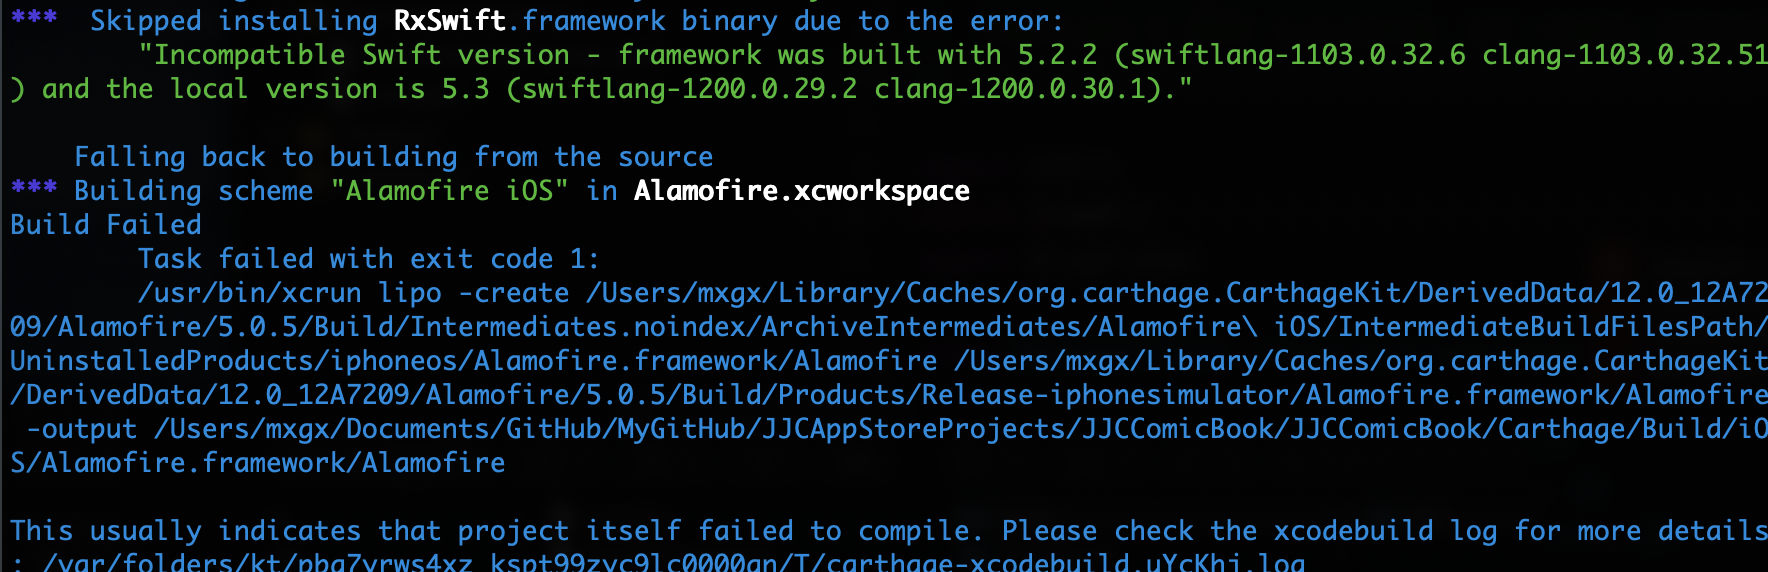 【iOS】升级 Xcode12 引起的 Carthage 配置变更问题